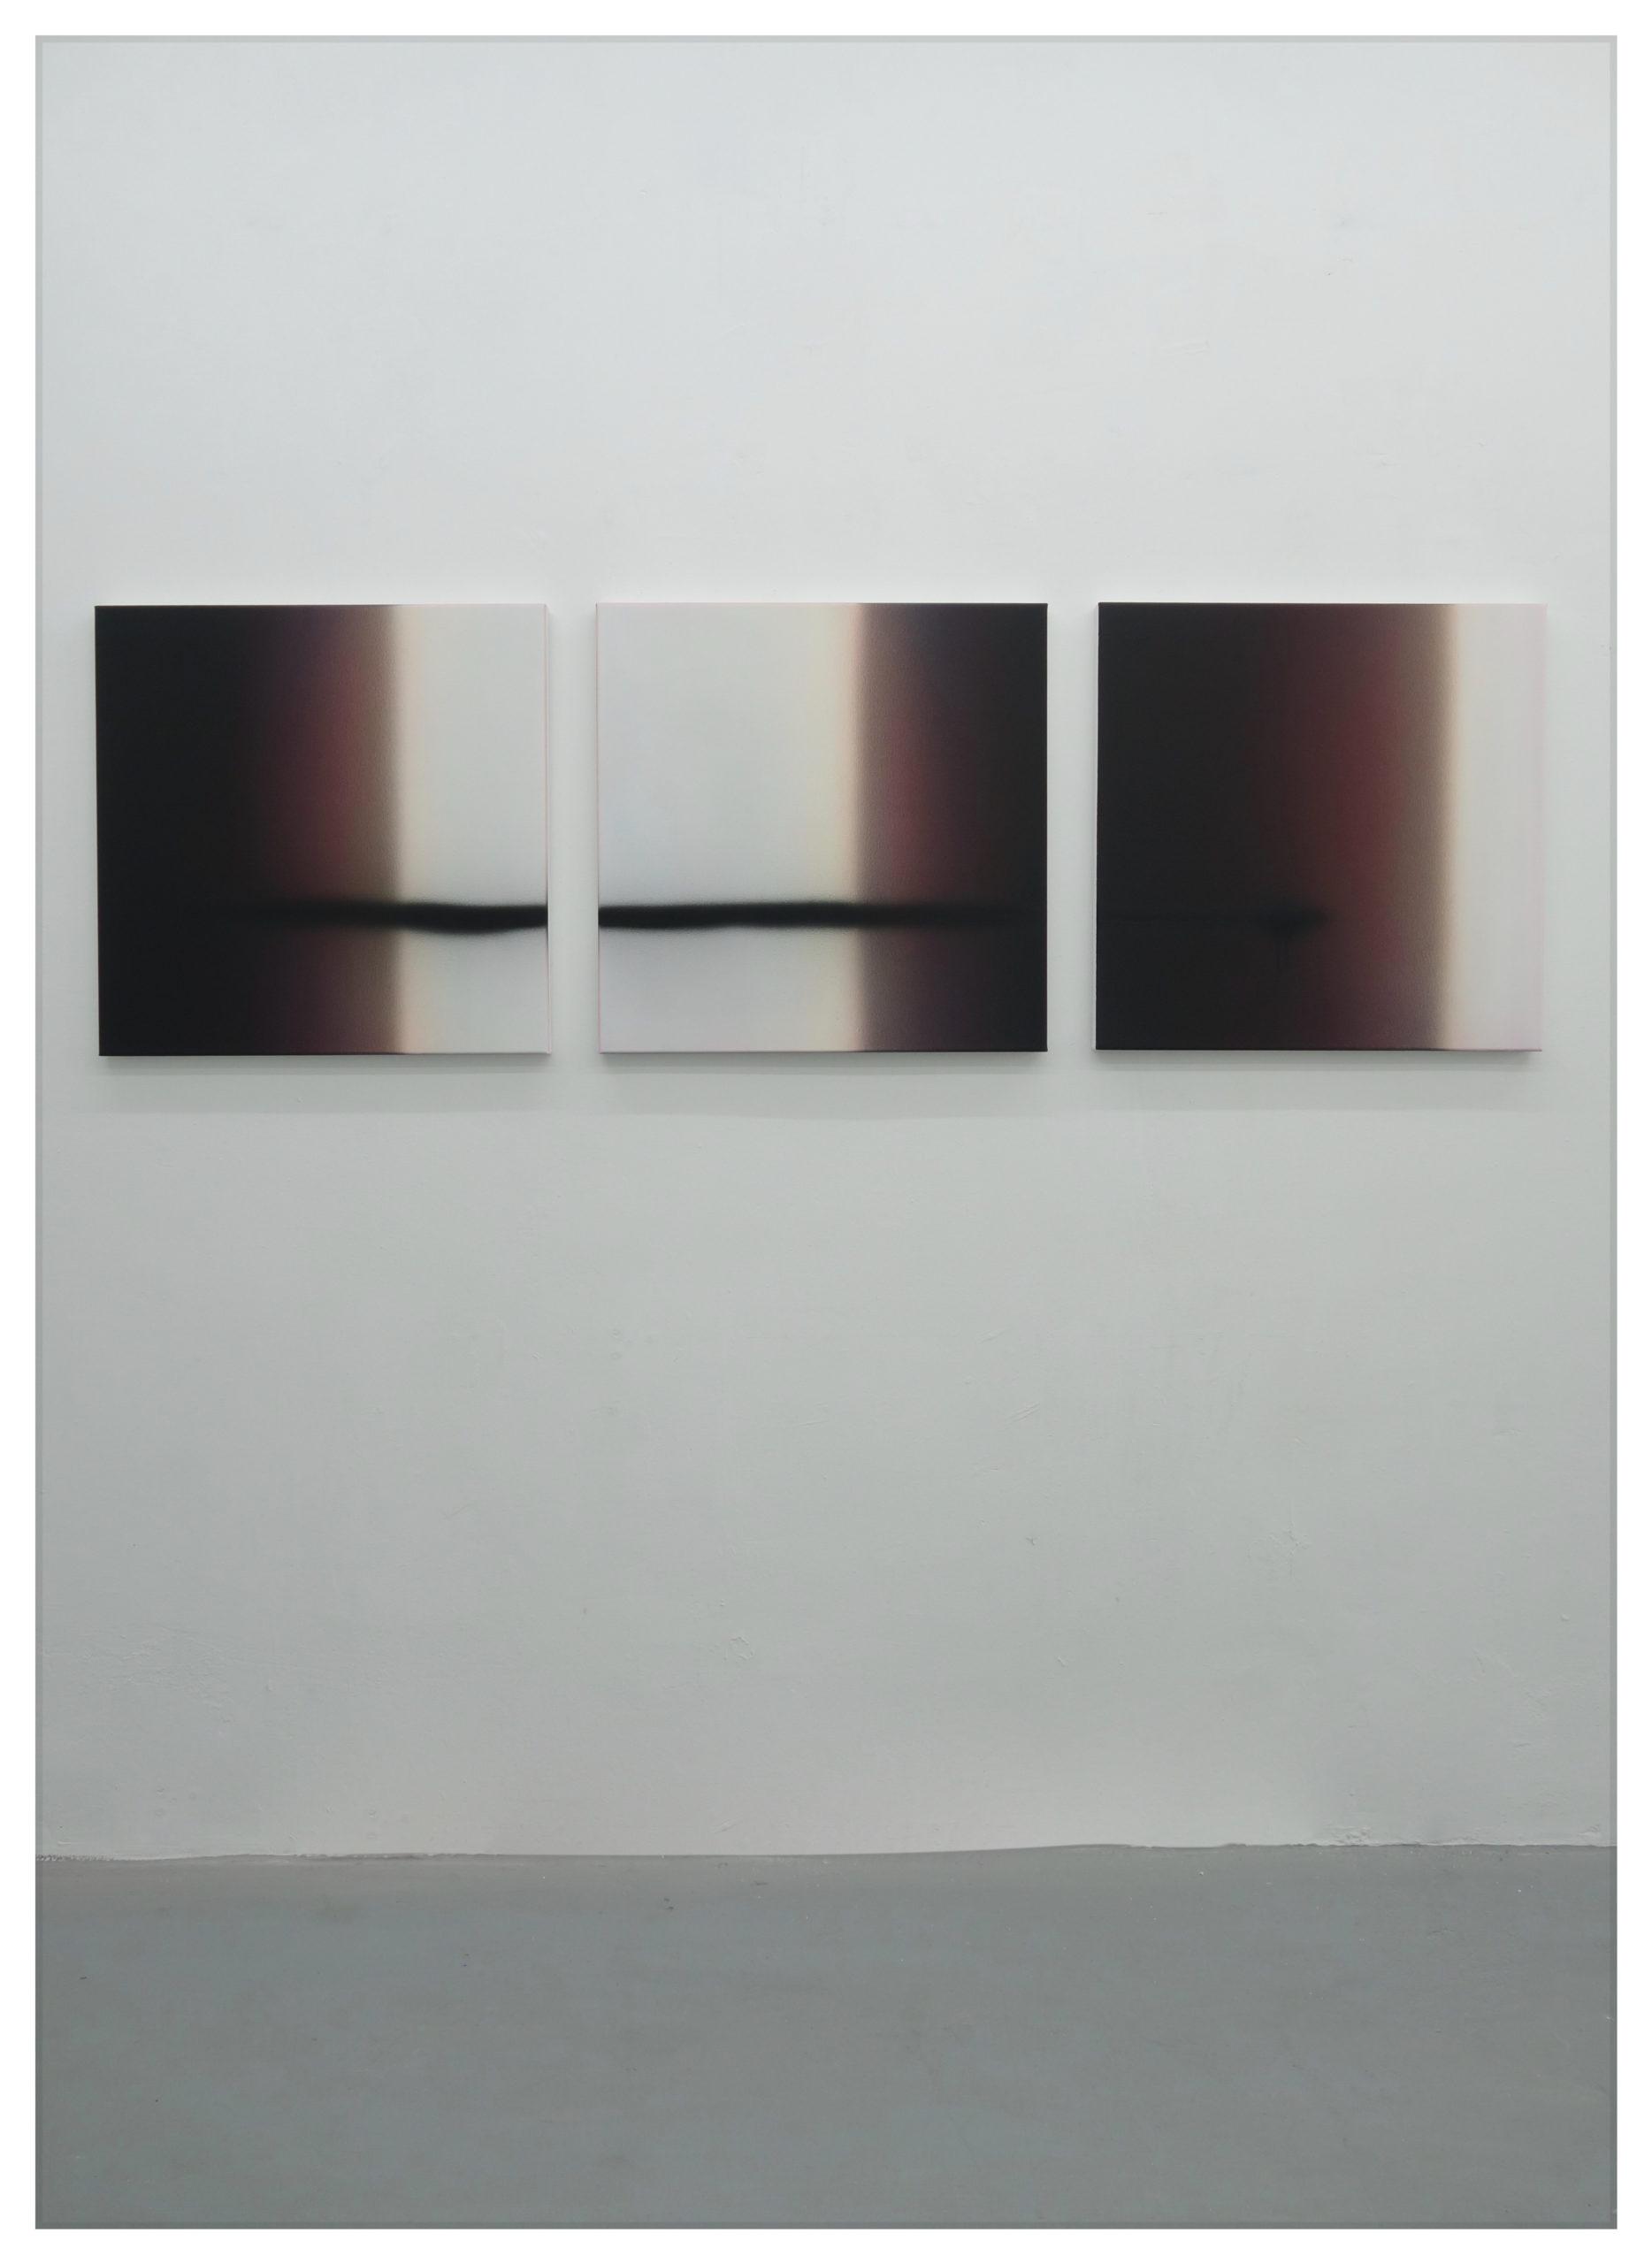 Nicolas Delprat, James, Fragmentation 4 acrylique sur toile 60×60 cm 2020, courtesy Nicolas Delprat